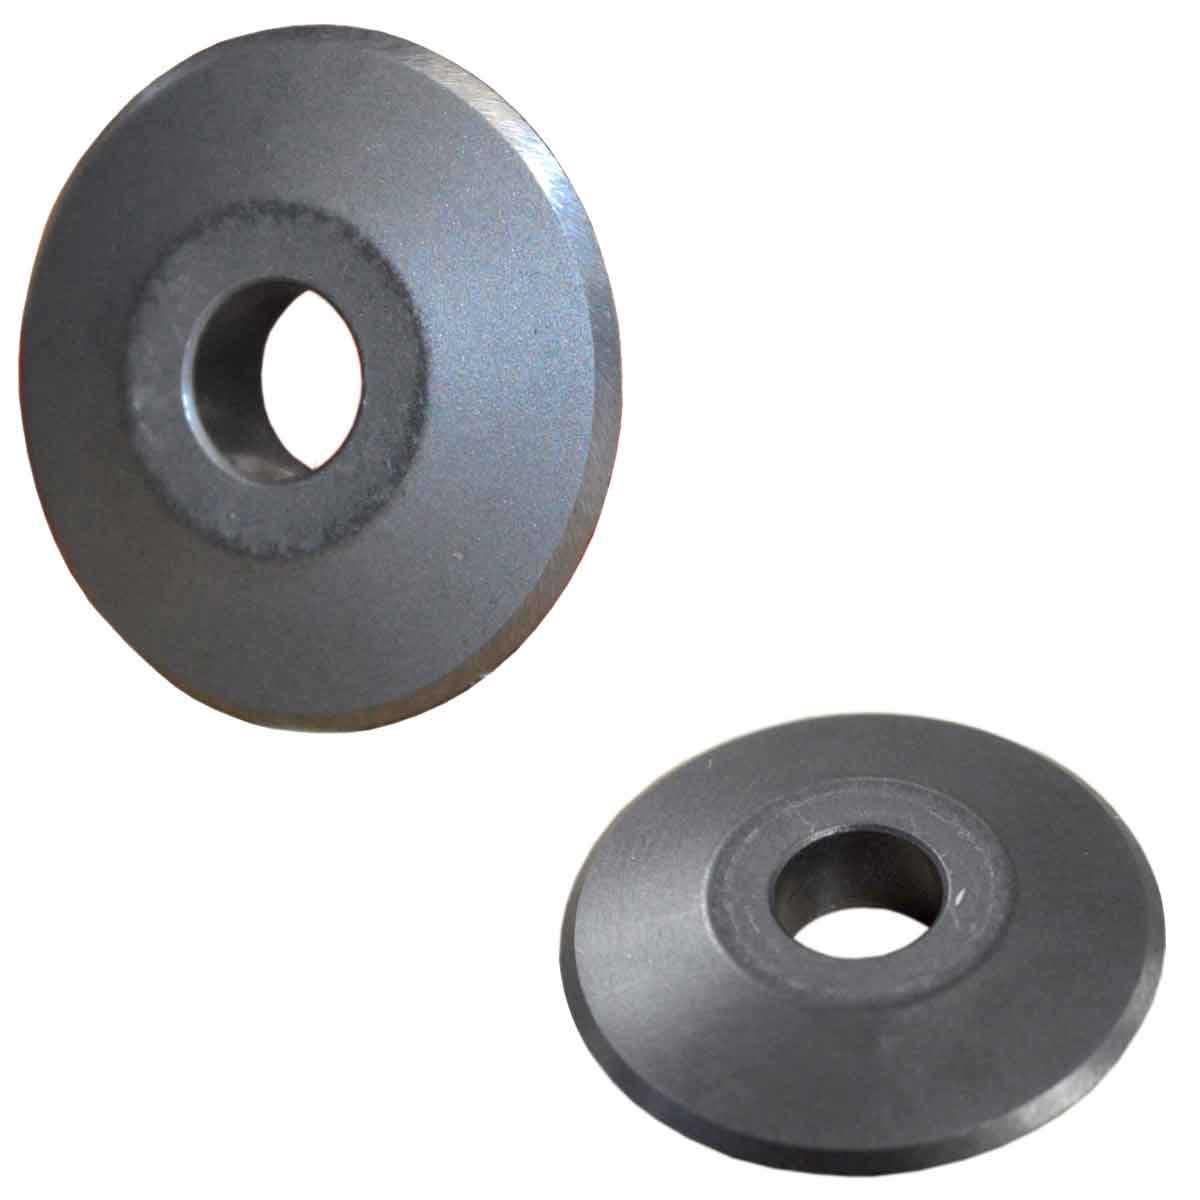 Tomecanic Tungsten Carbide Wheel